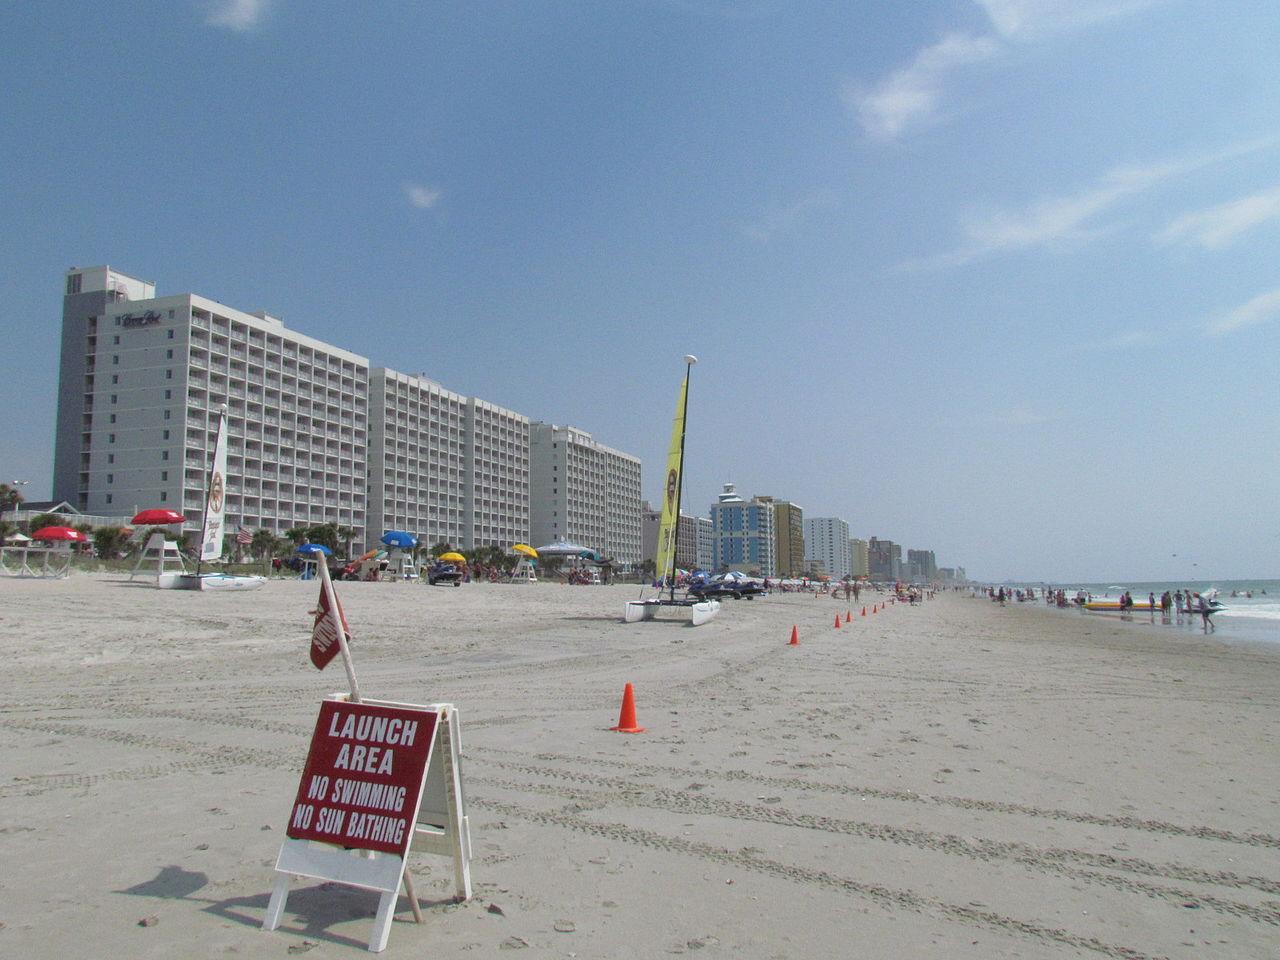 Hotels Myrtle Beach South Carolina September